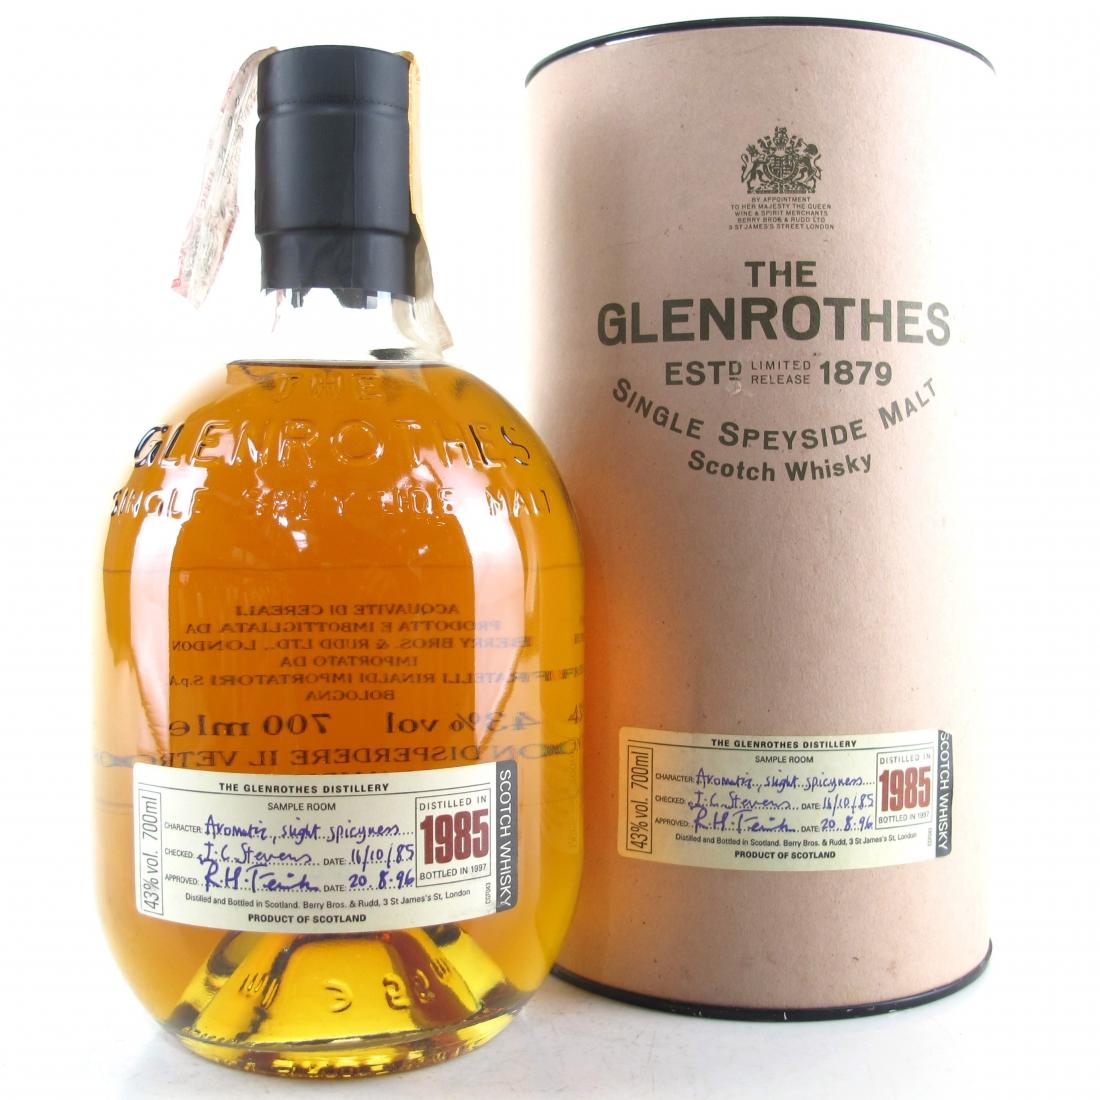 Glenrothes 1985